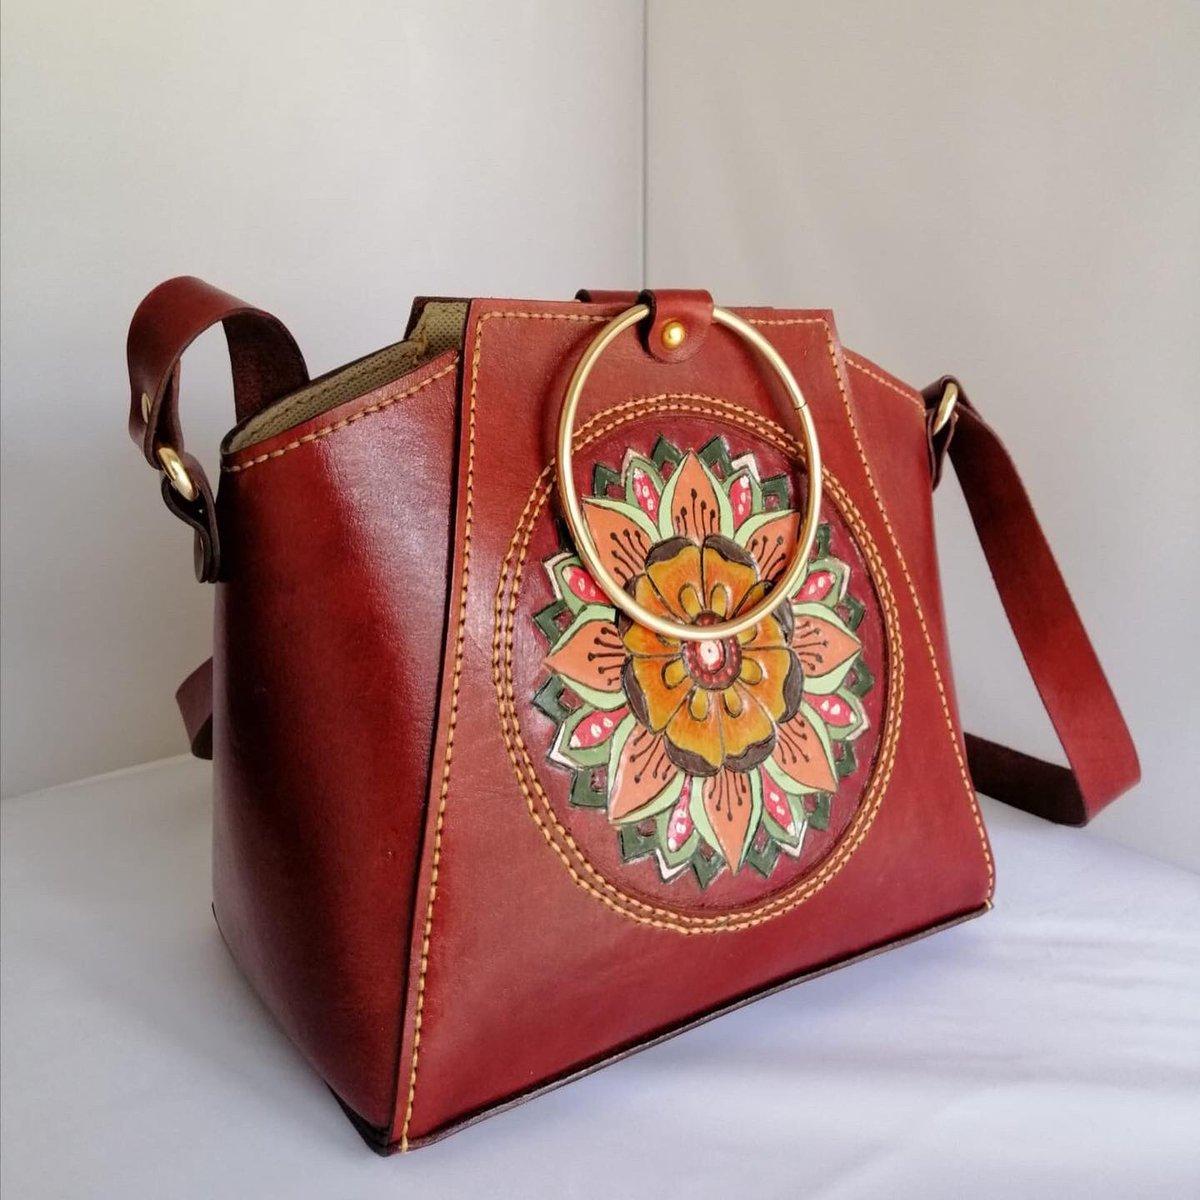 % 100 Deri. % 100 El yapımı  Newhttp://handmadebagstore.com  #leathercraft #onlineshop  #leathergoods #leather #bagshop #newseason #handbag #bags #handmade #shoulderbag #leatherbagshop #realleather #customdesign #bagdesign #designer  #handmadebag #leatherbag #newcollectionpic.twitter.com/B9xaYEhbuJ